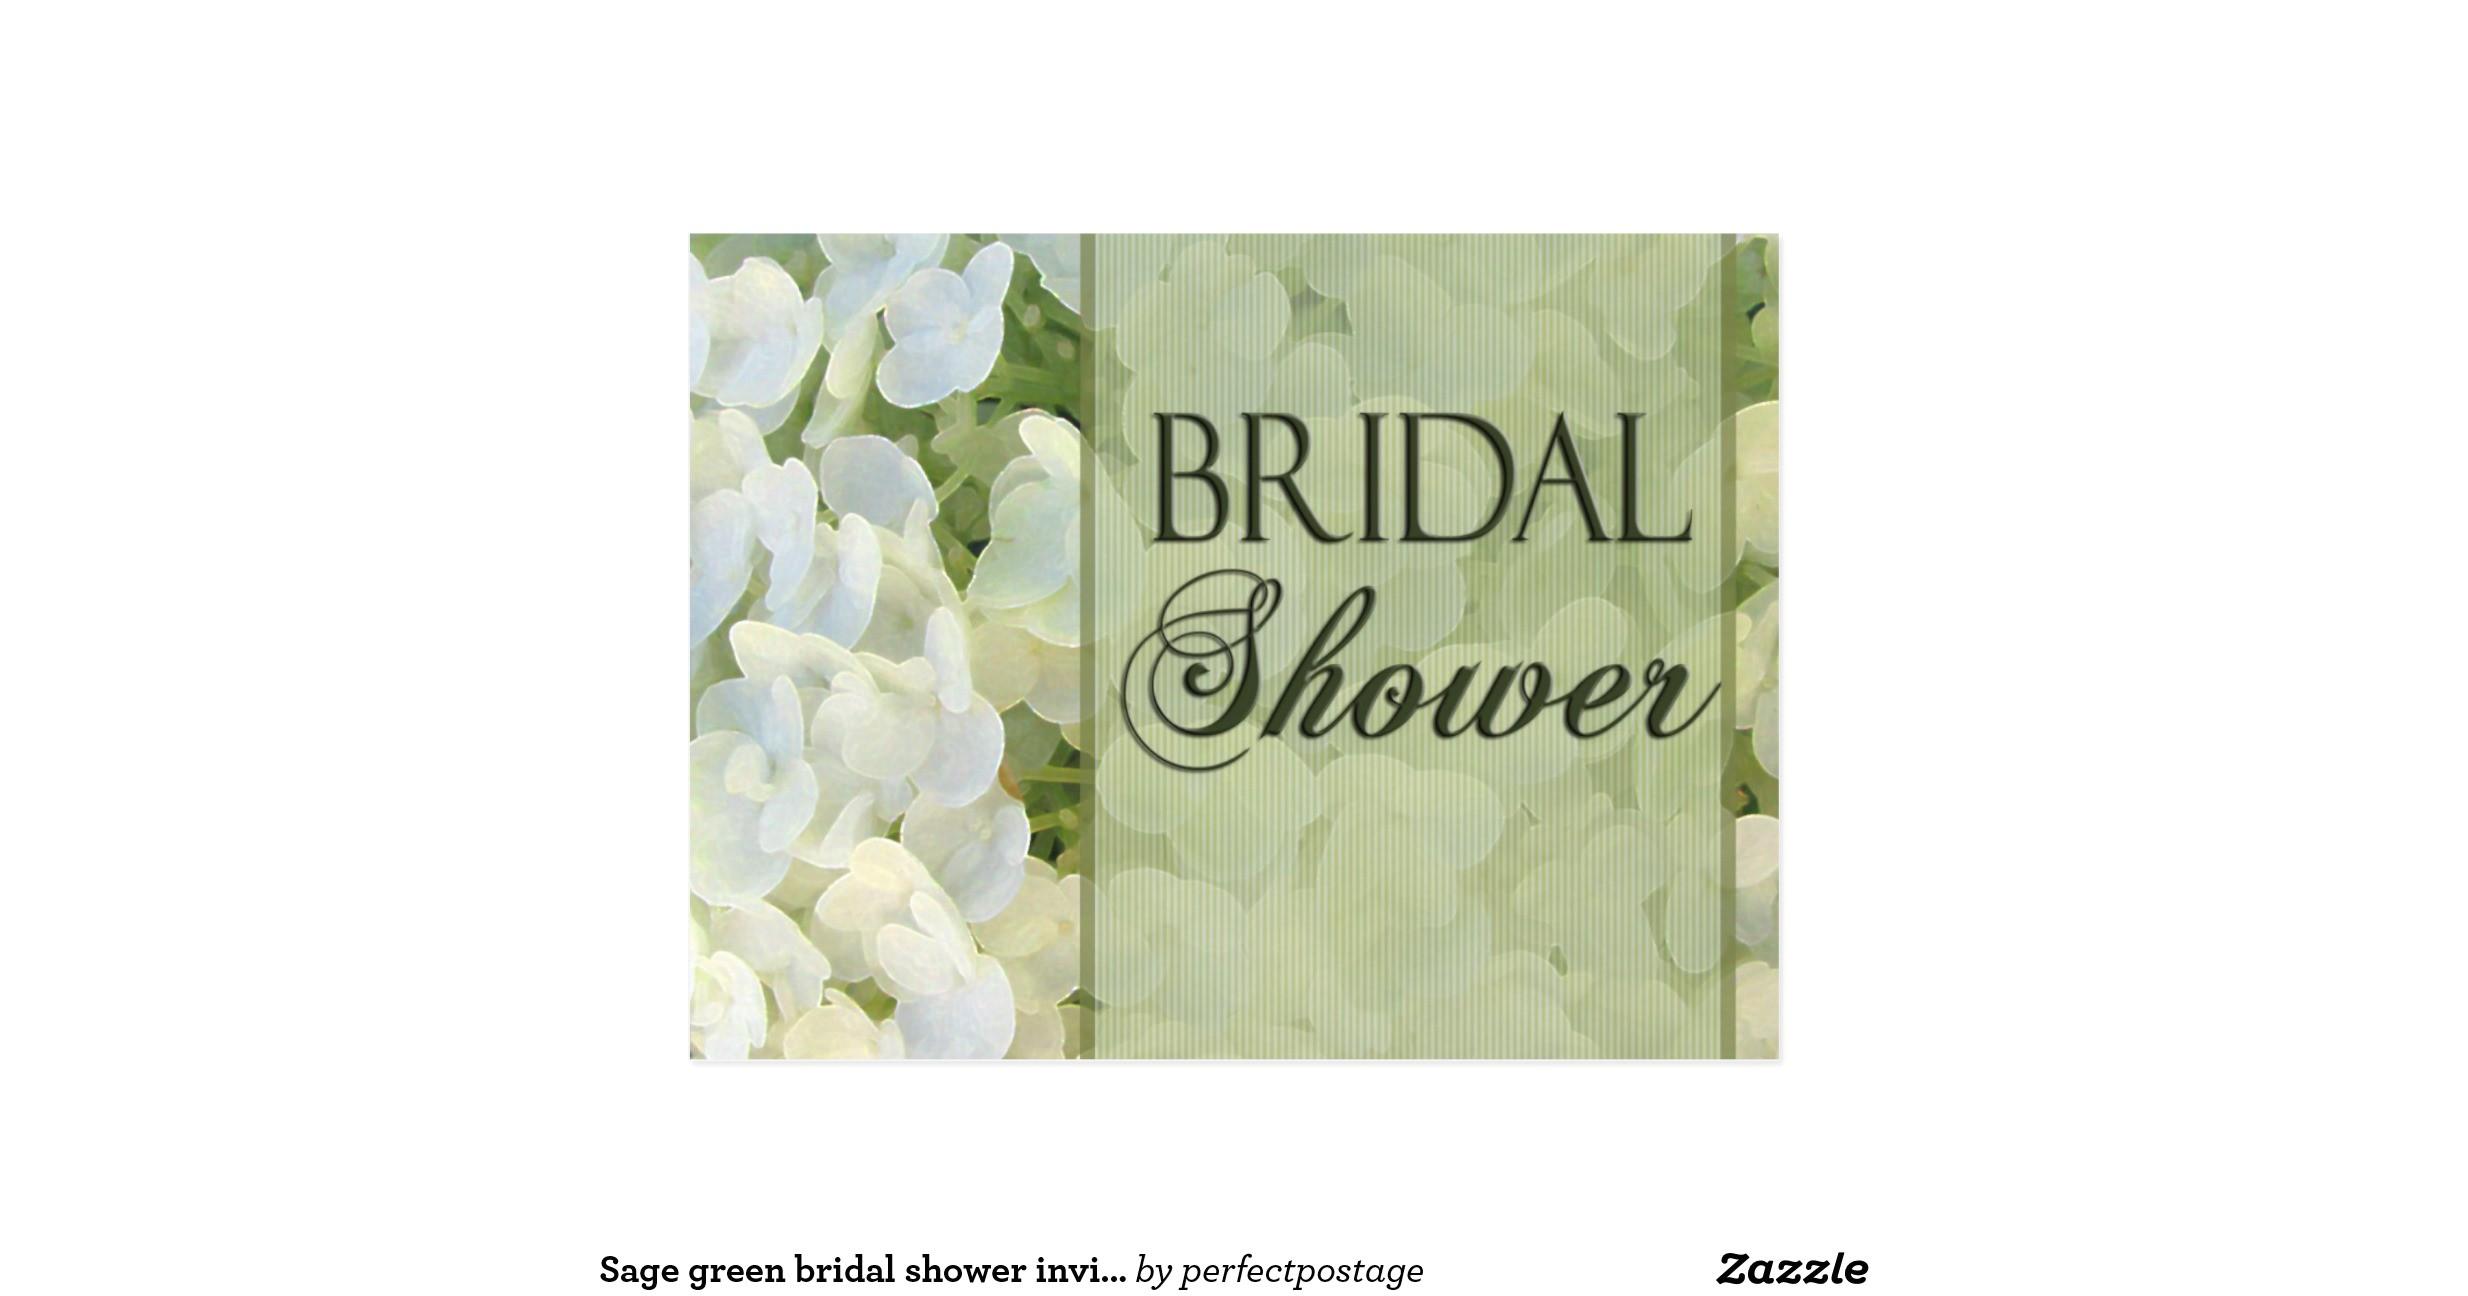 sage green bridal shower invitations postcard